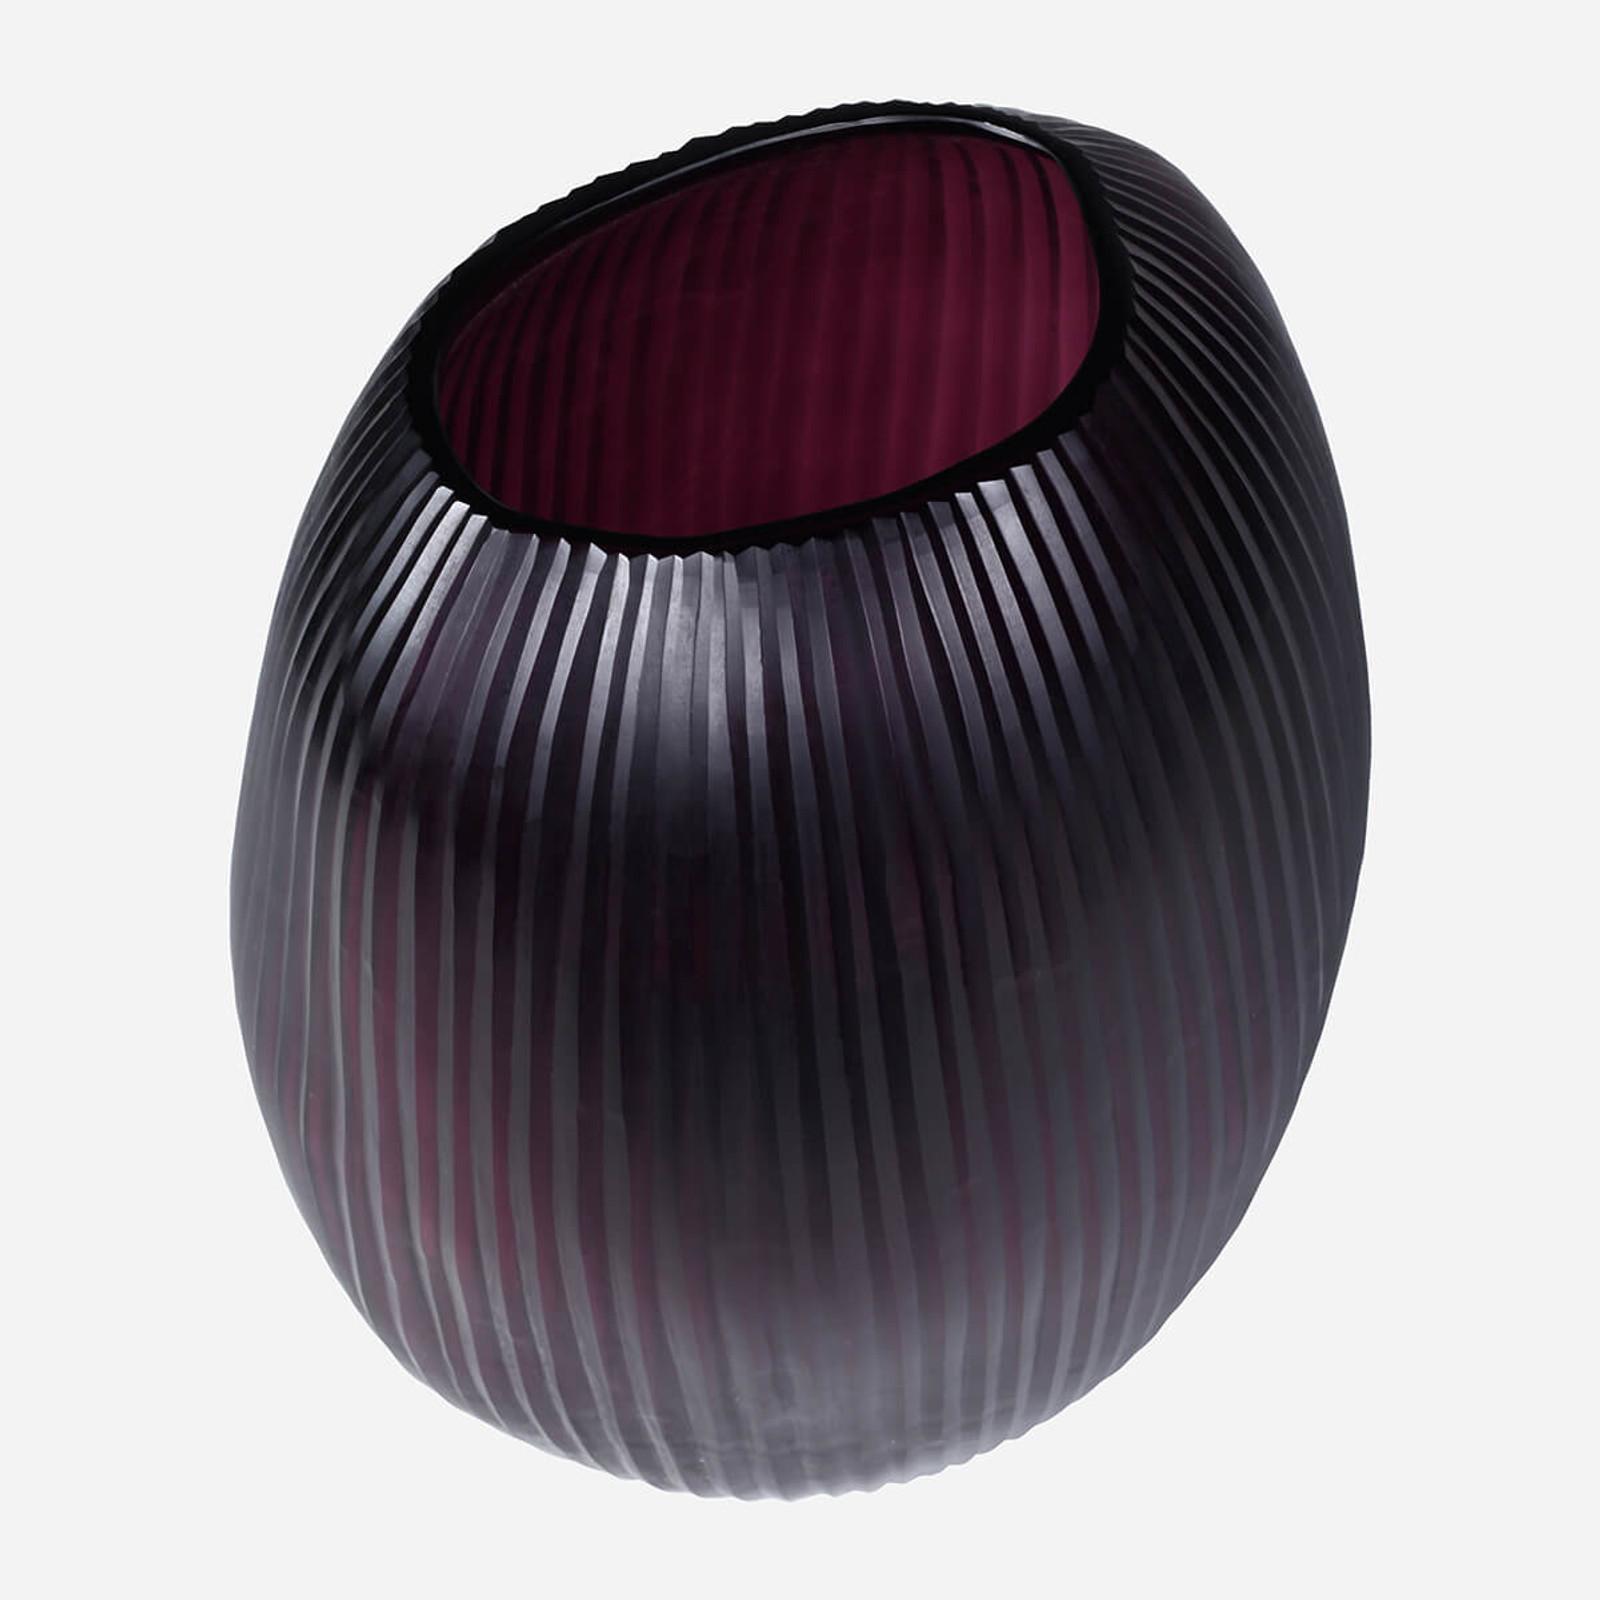 Seine Large Vase, Amethyst